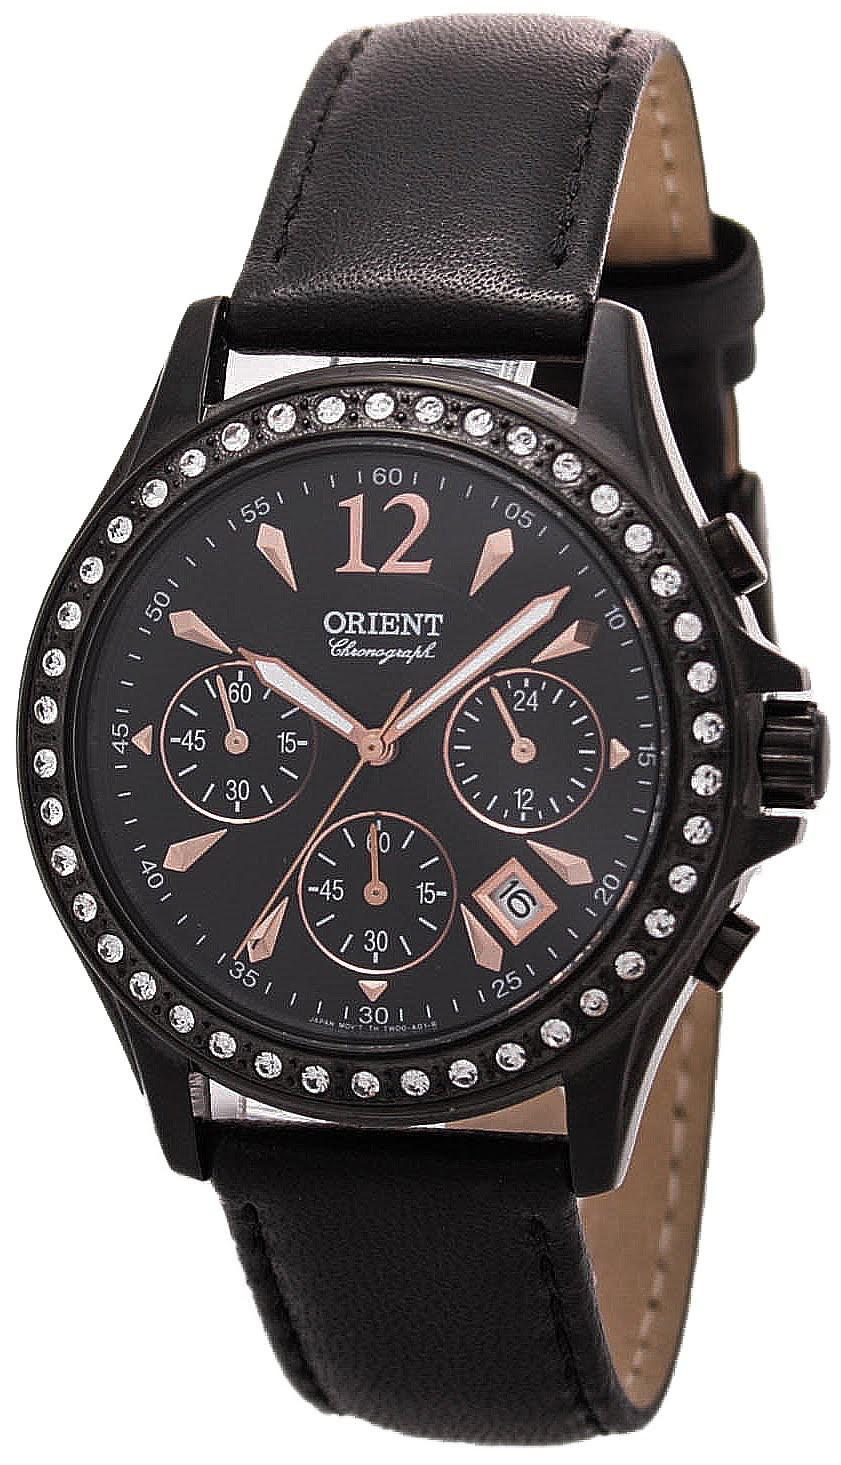 Orient FTW00001B